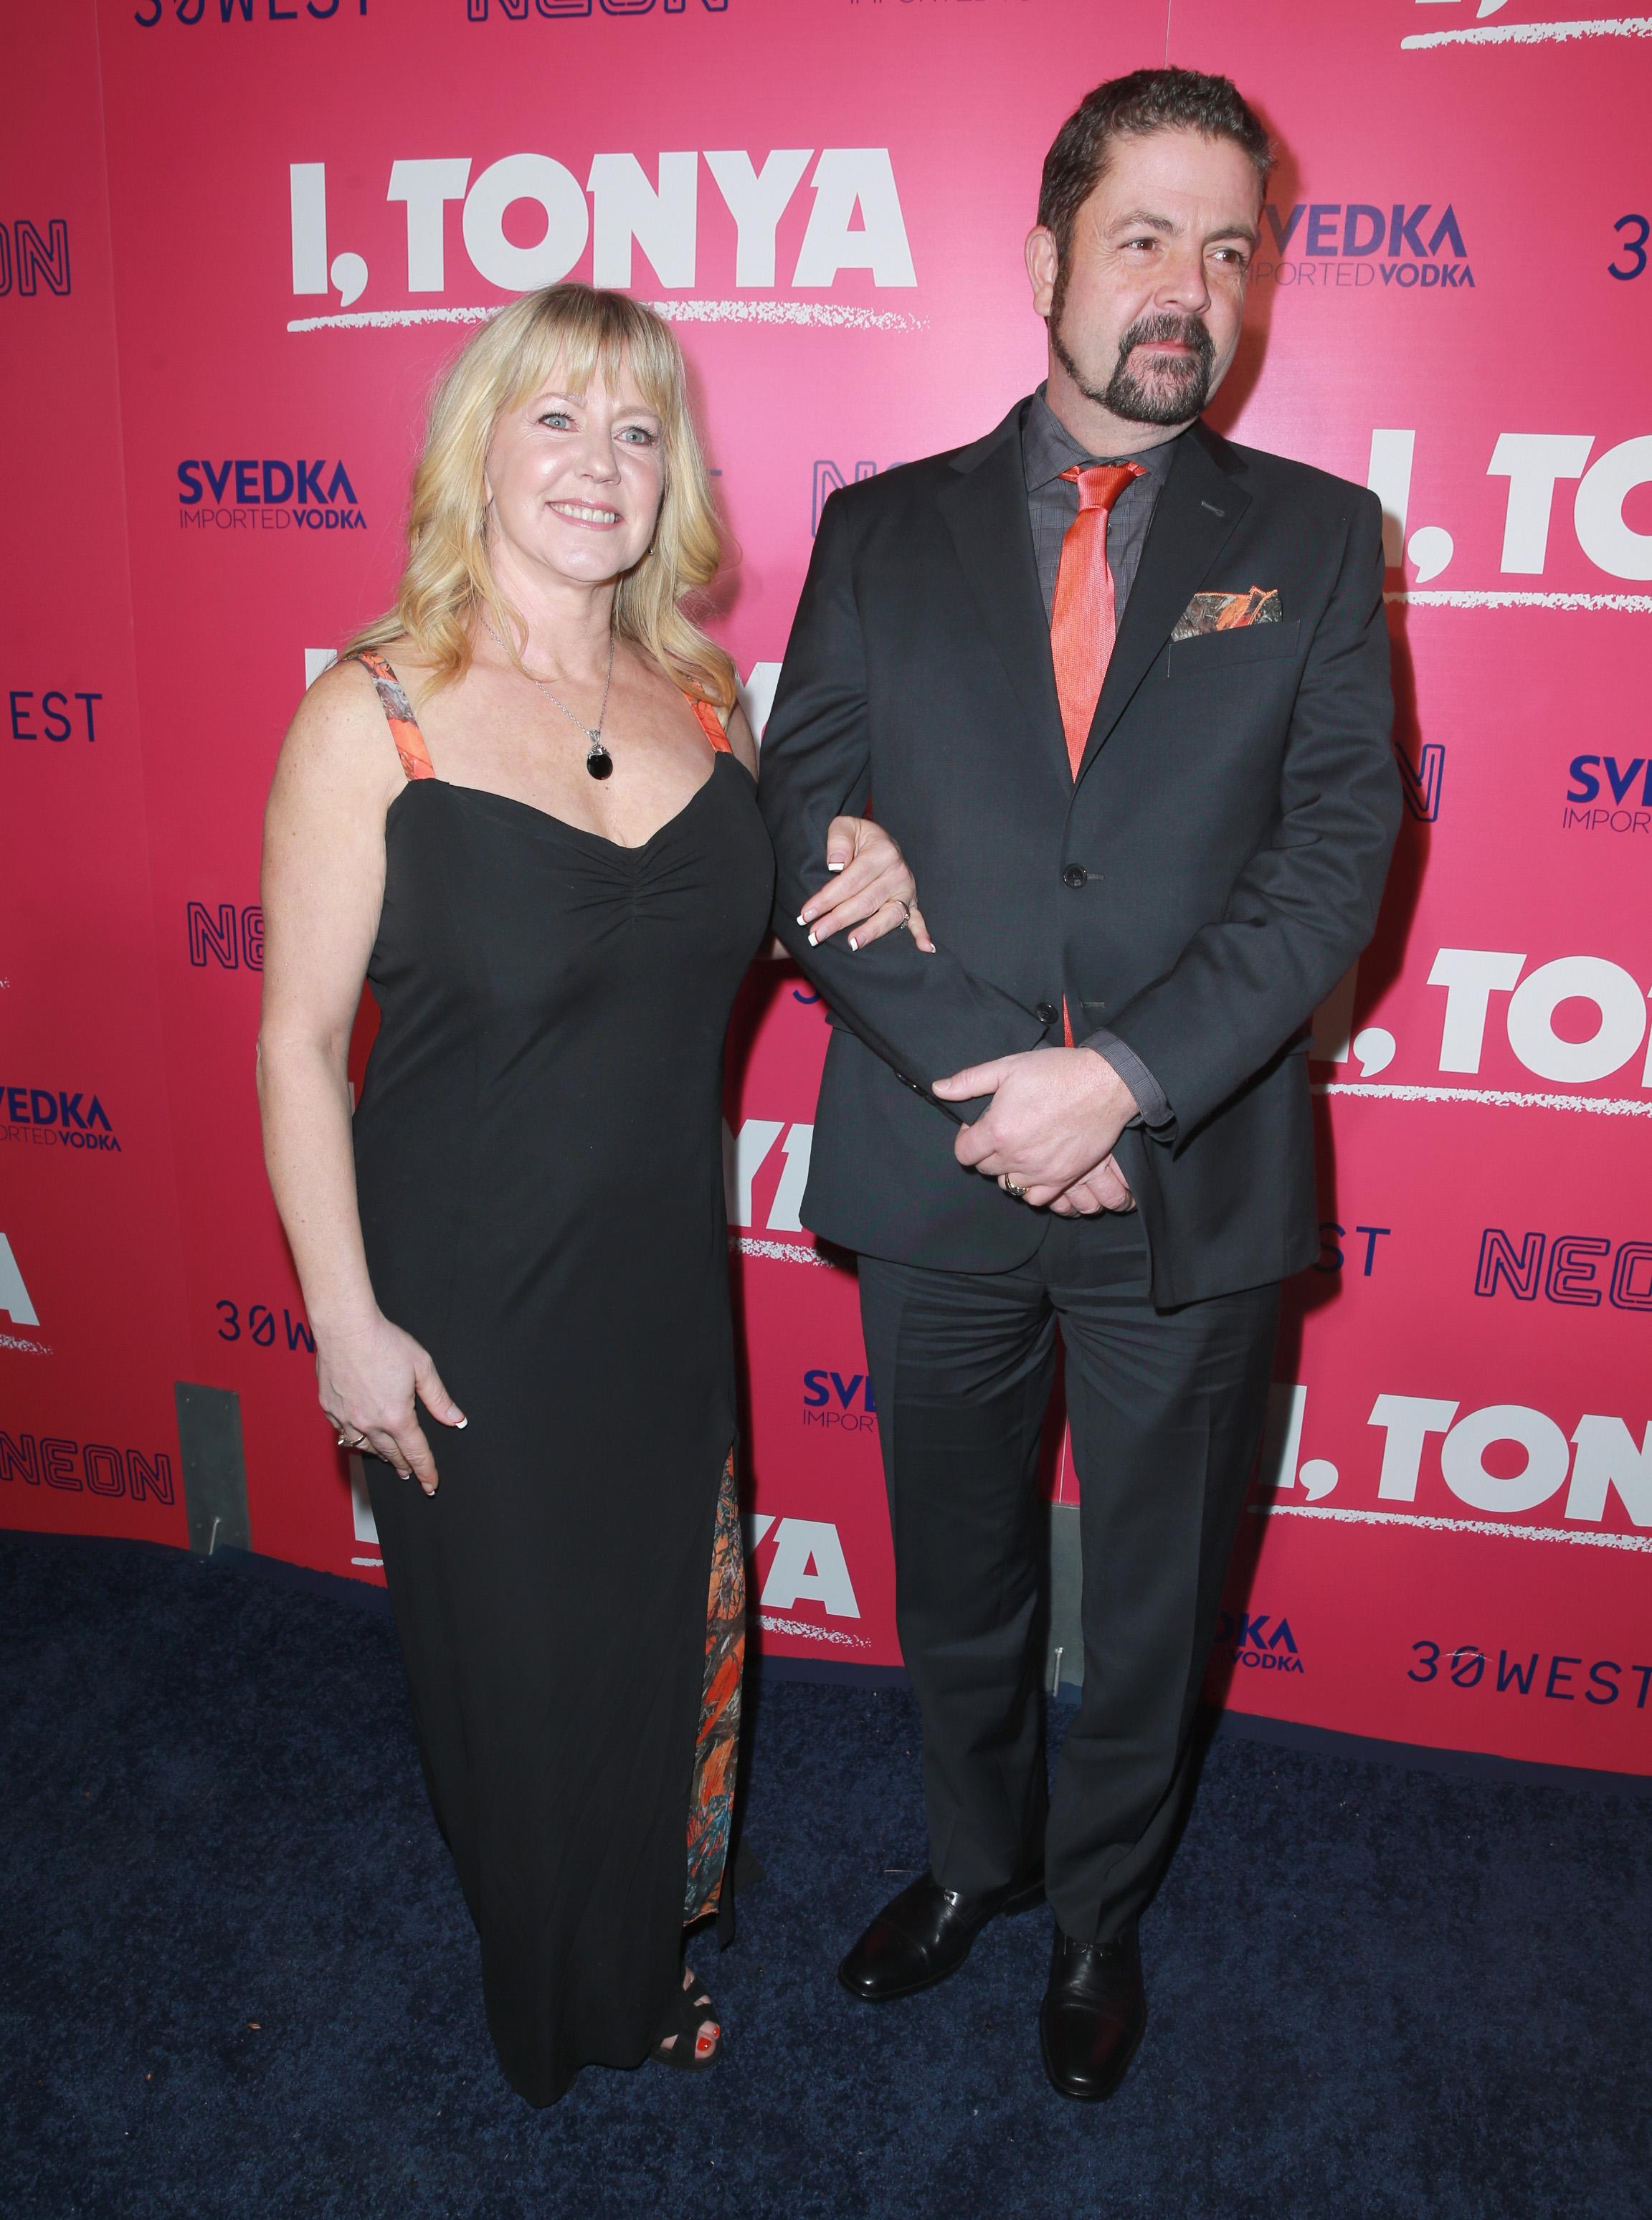 Joseph Jens Price, Tonya Harding Husband, Who is Tonya Harding Married to